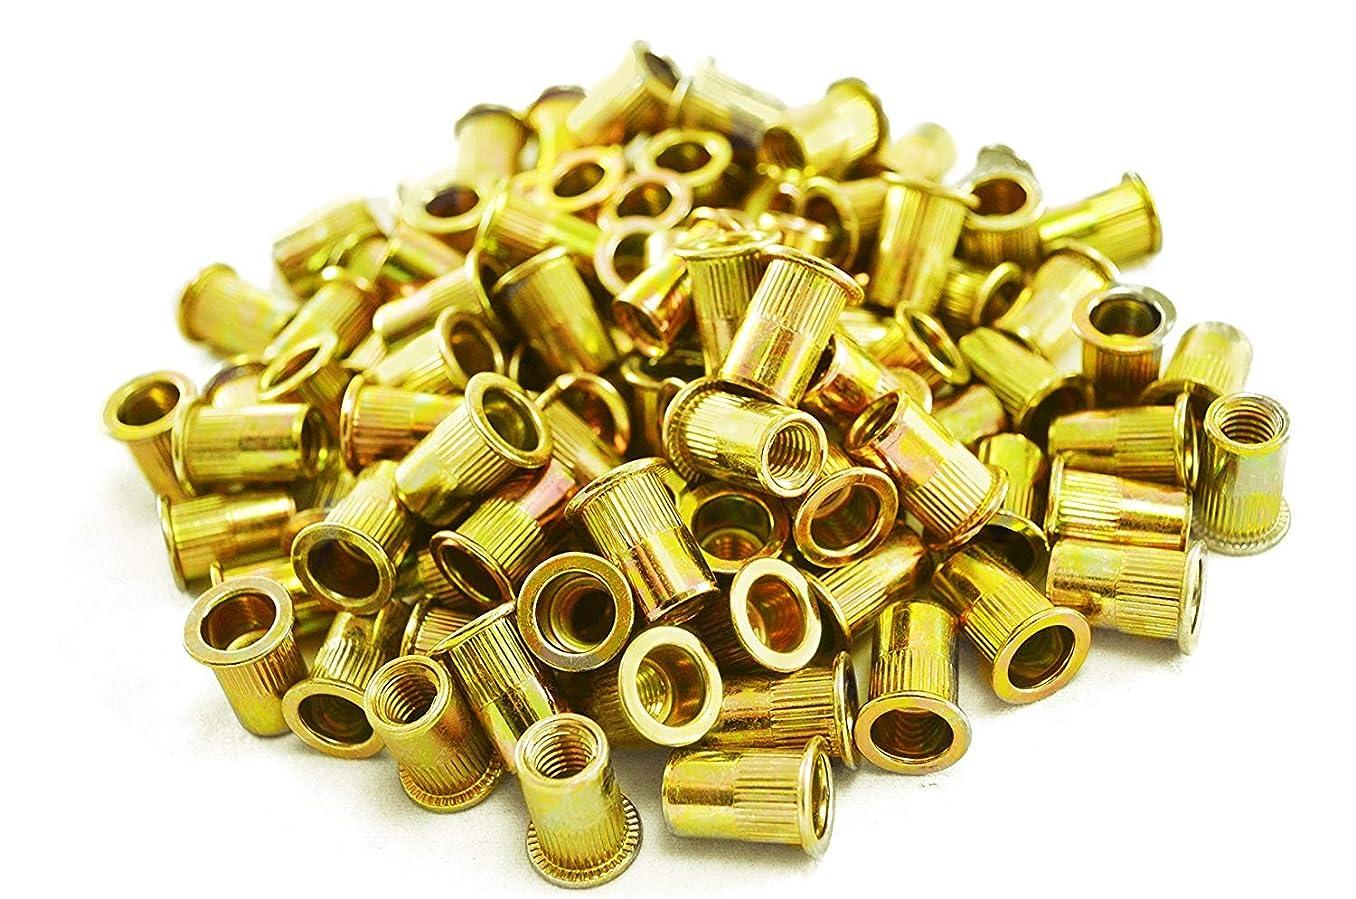 Liyafy 100Pcs Pneumatic Tool Pull Nut Steel Rivet Nuts M10 X 21 (Carbon Steel/Color zinc)